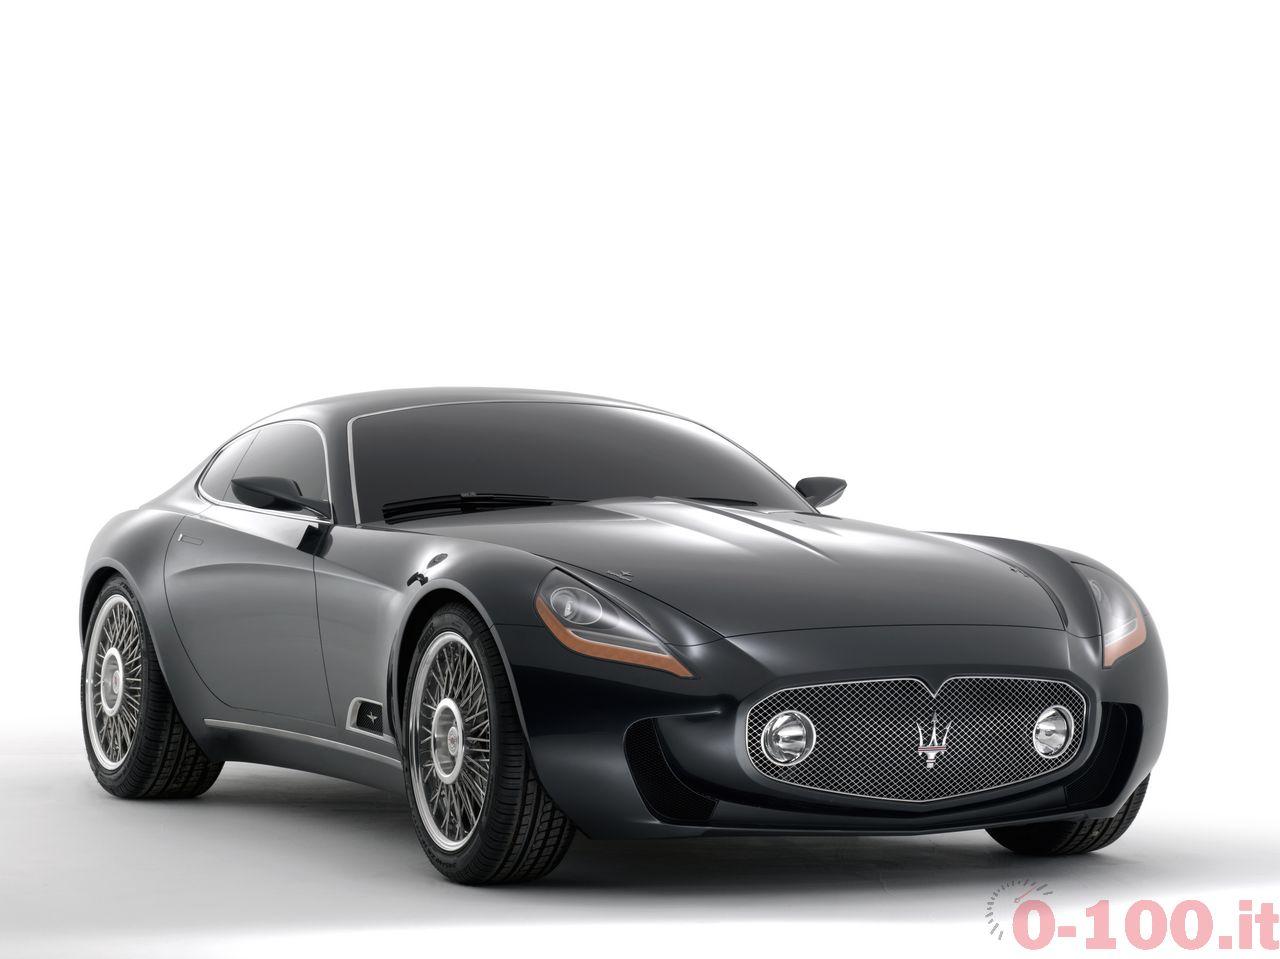 maserati-a8-gcs-touring-superleggera-carrozzeria-0-100_1